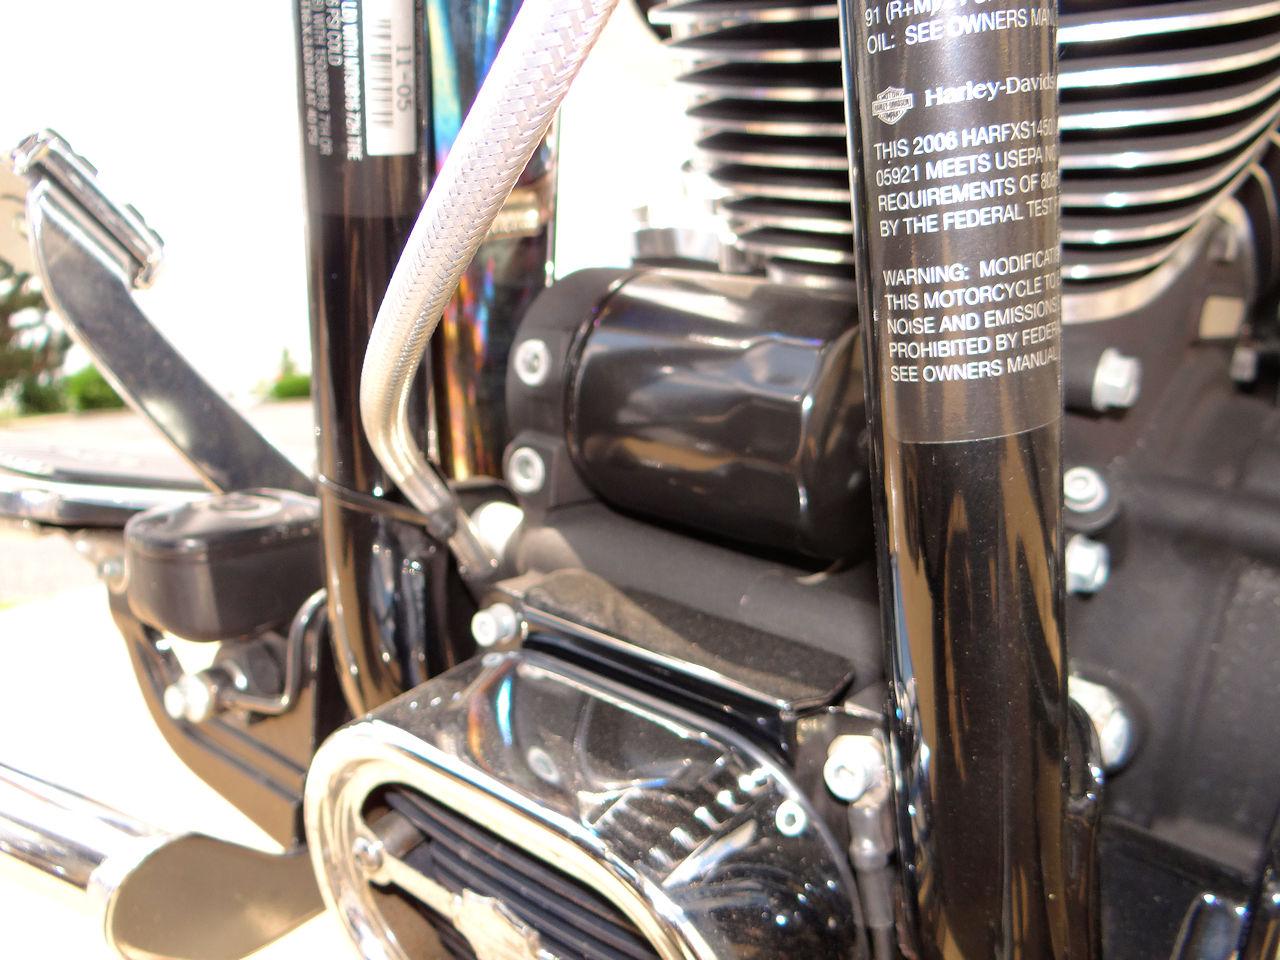 2006 Harley Davidson FLSTNI 91